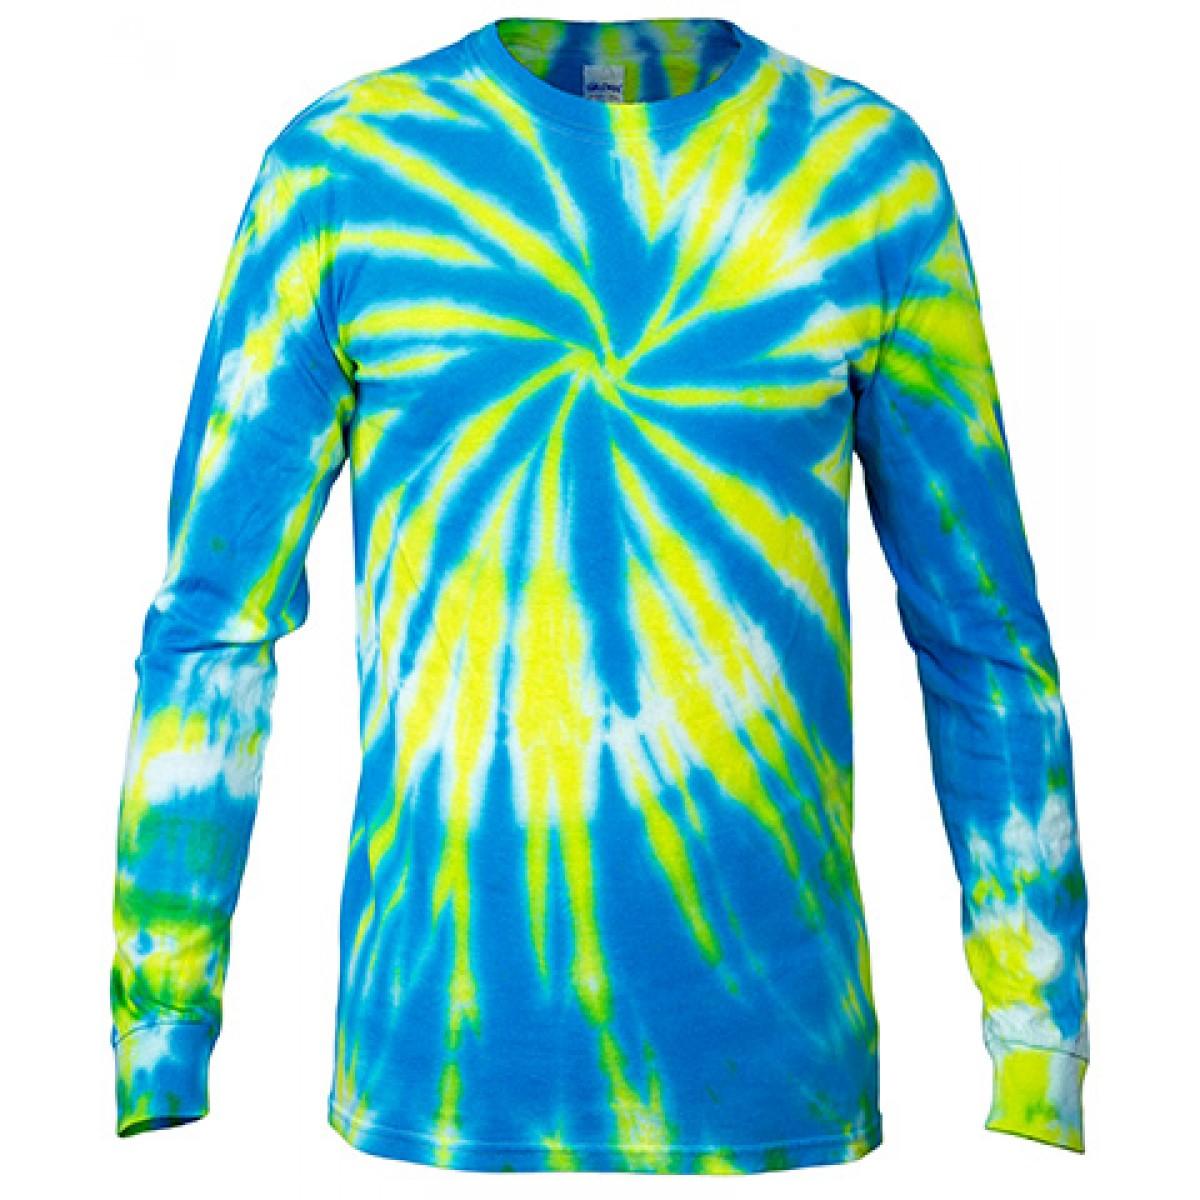 Multi Color Tie-Dye Long Sleeve Shirt